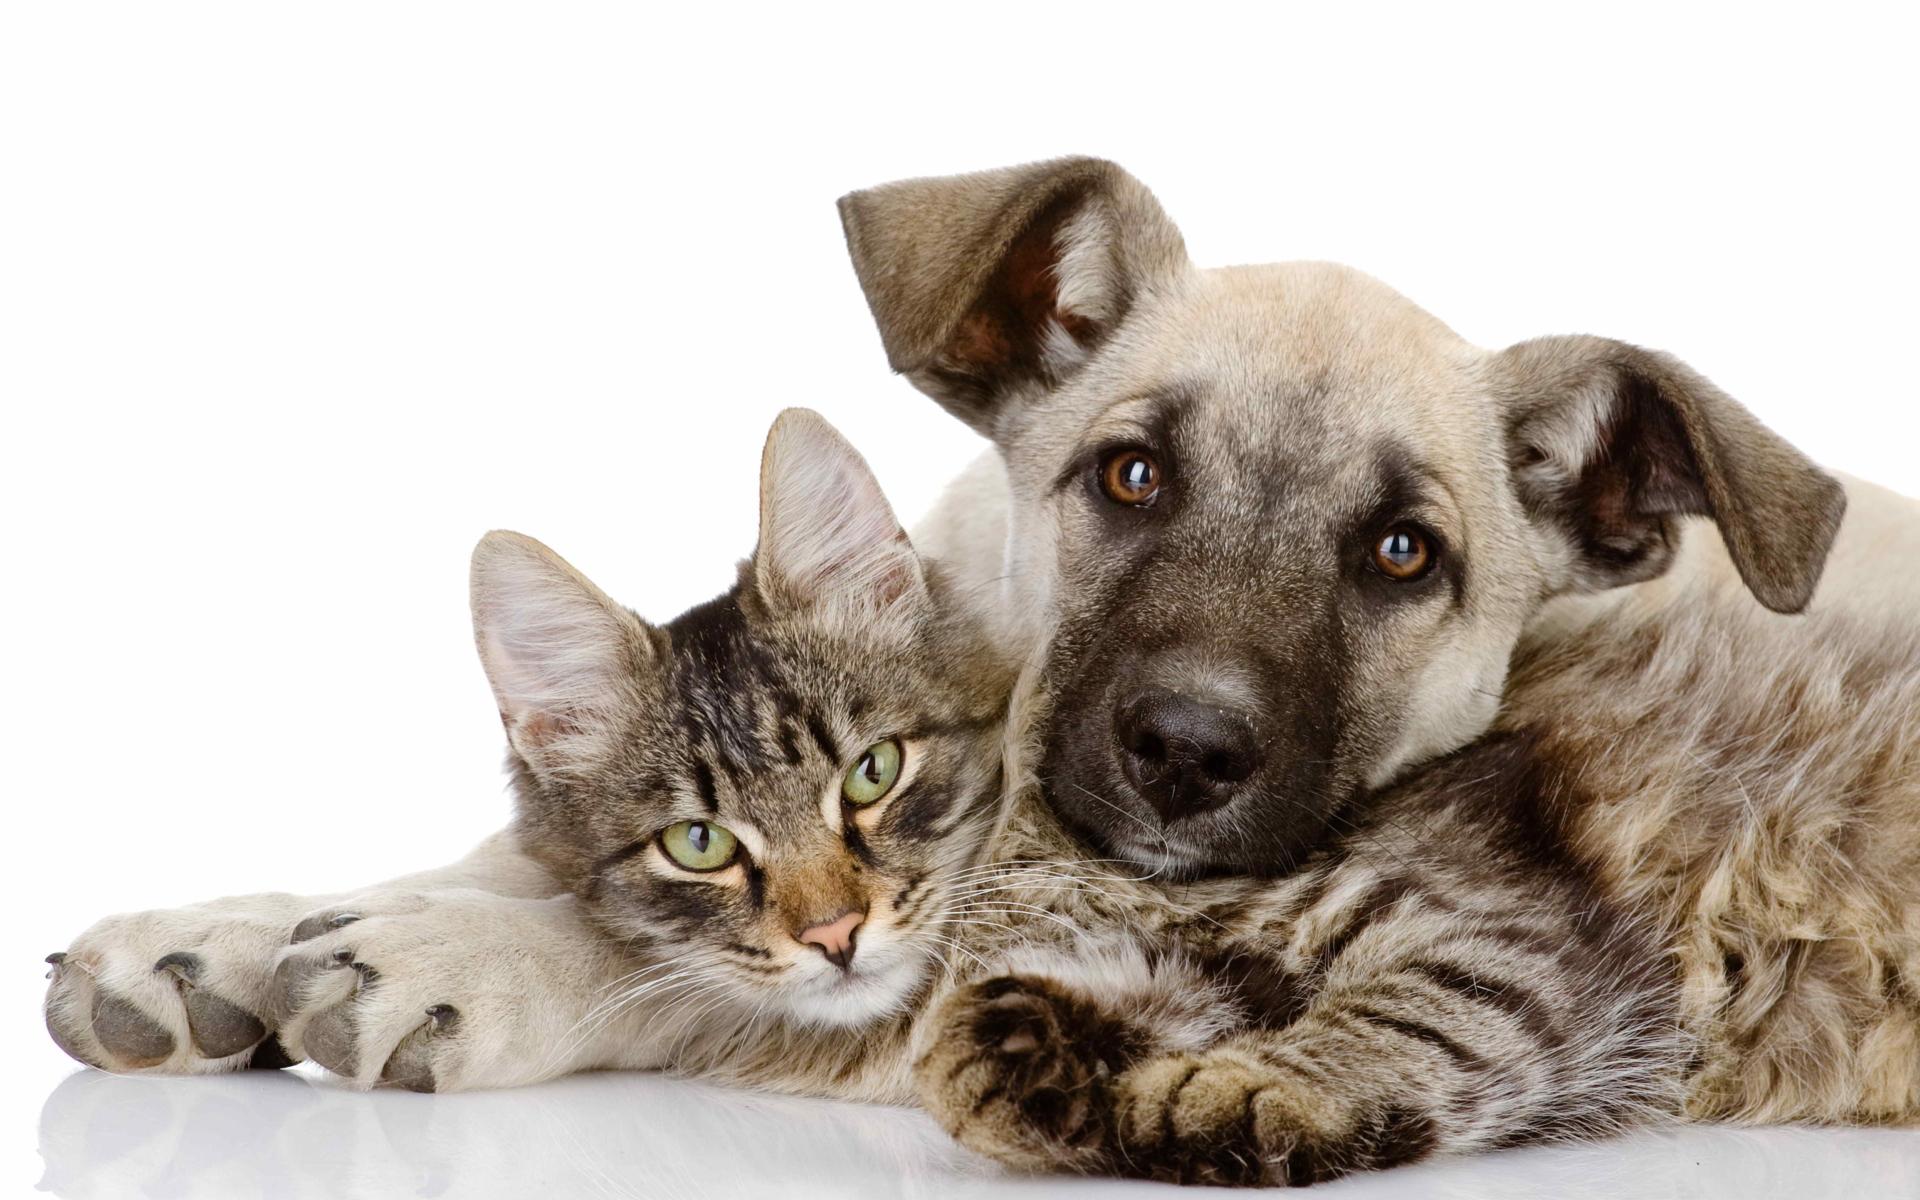 Картинка Кошка и собака » Кошки » Животные » Картинки 24 ...